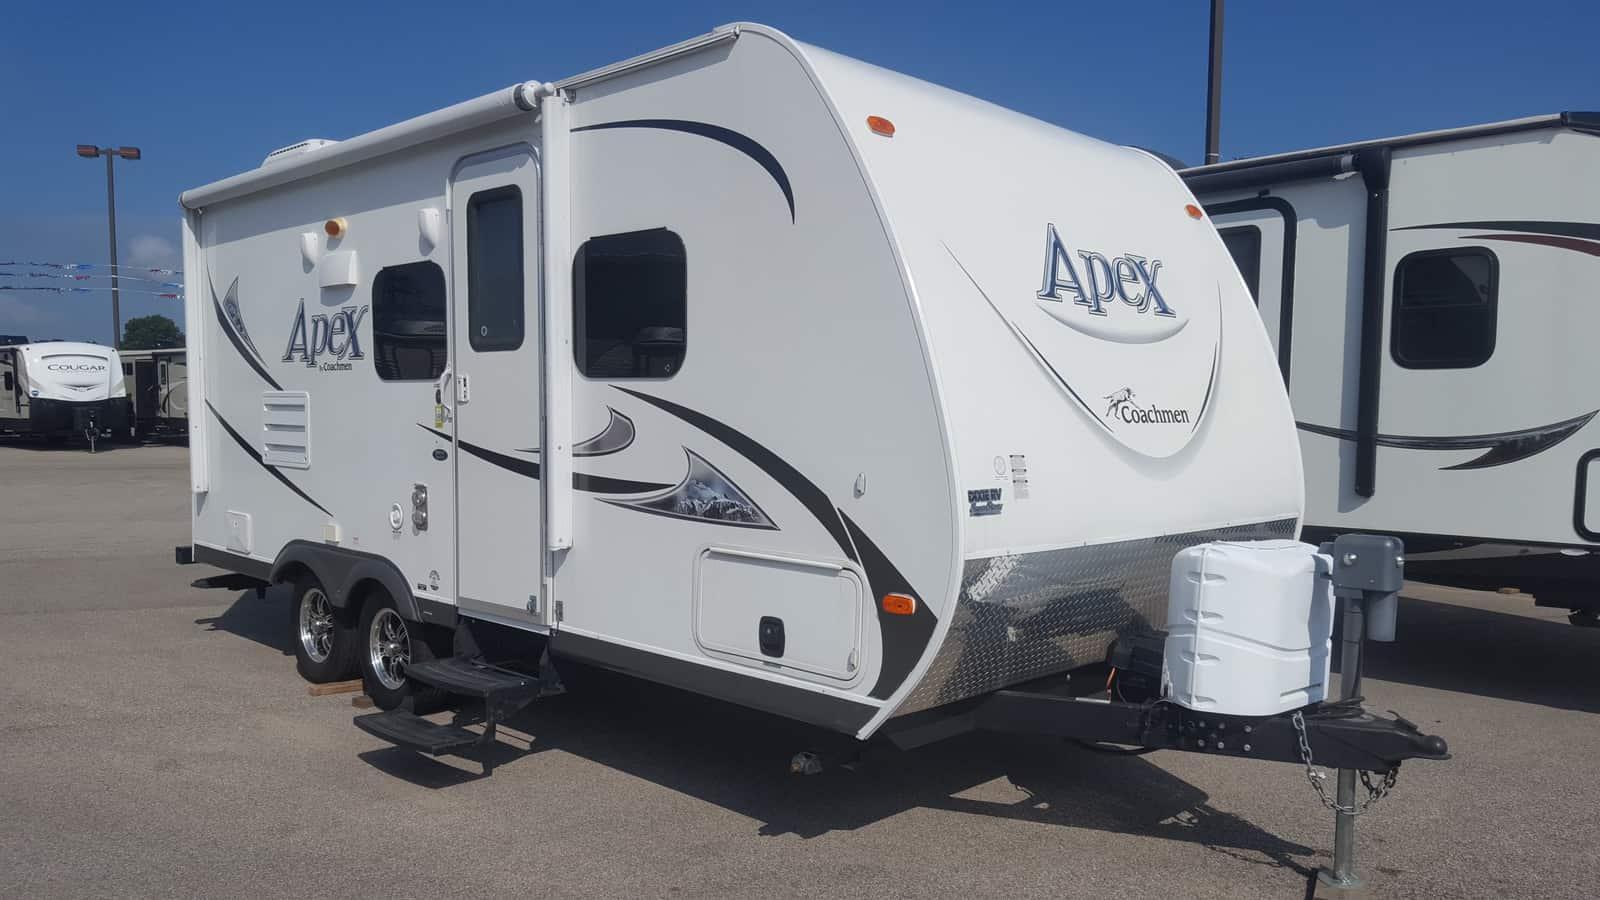 USED 2014 Coachmen APEX 22QBS - American RV